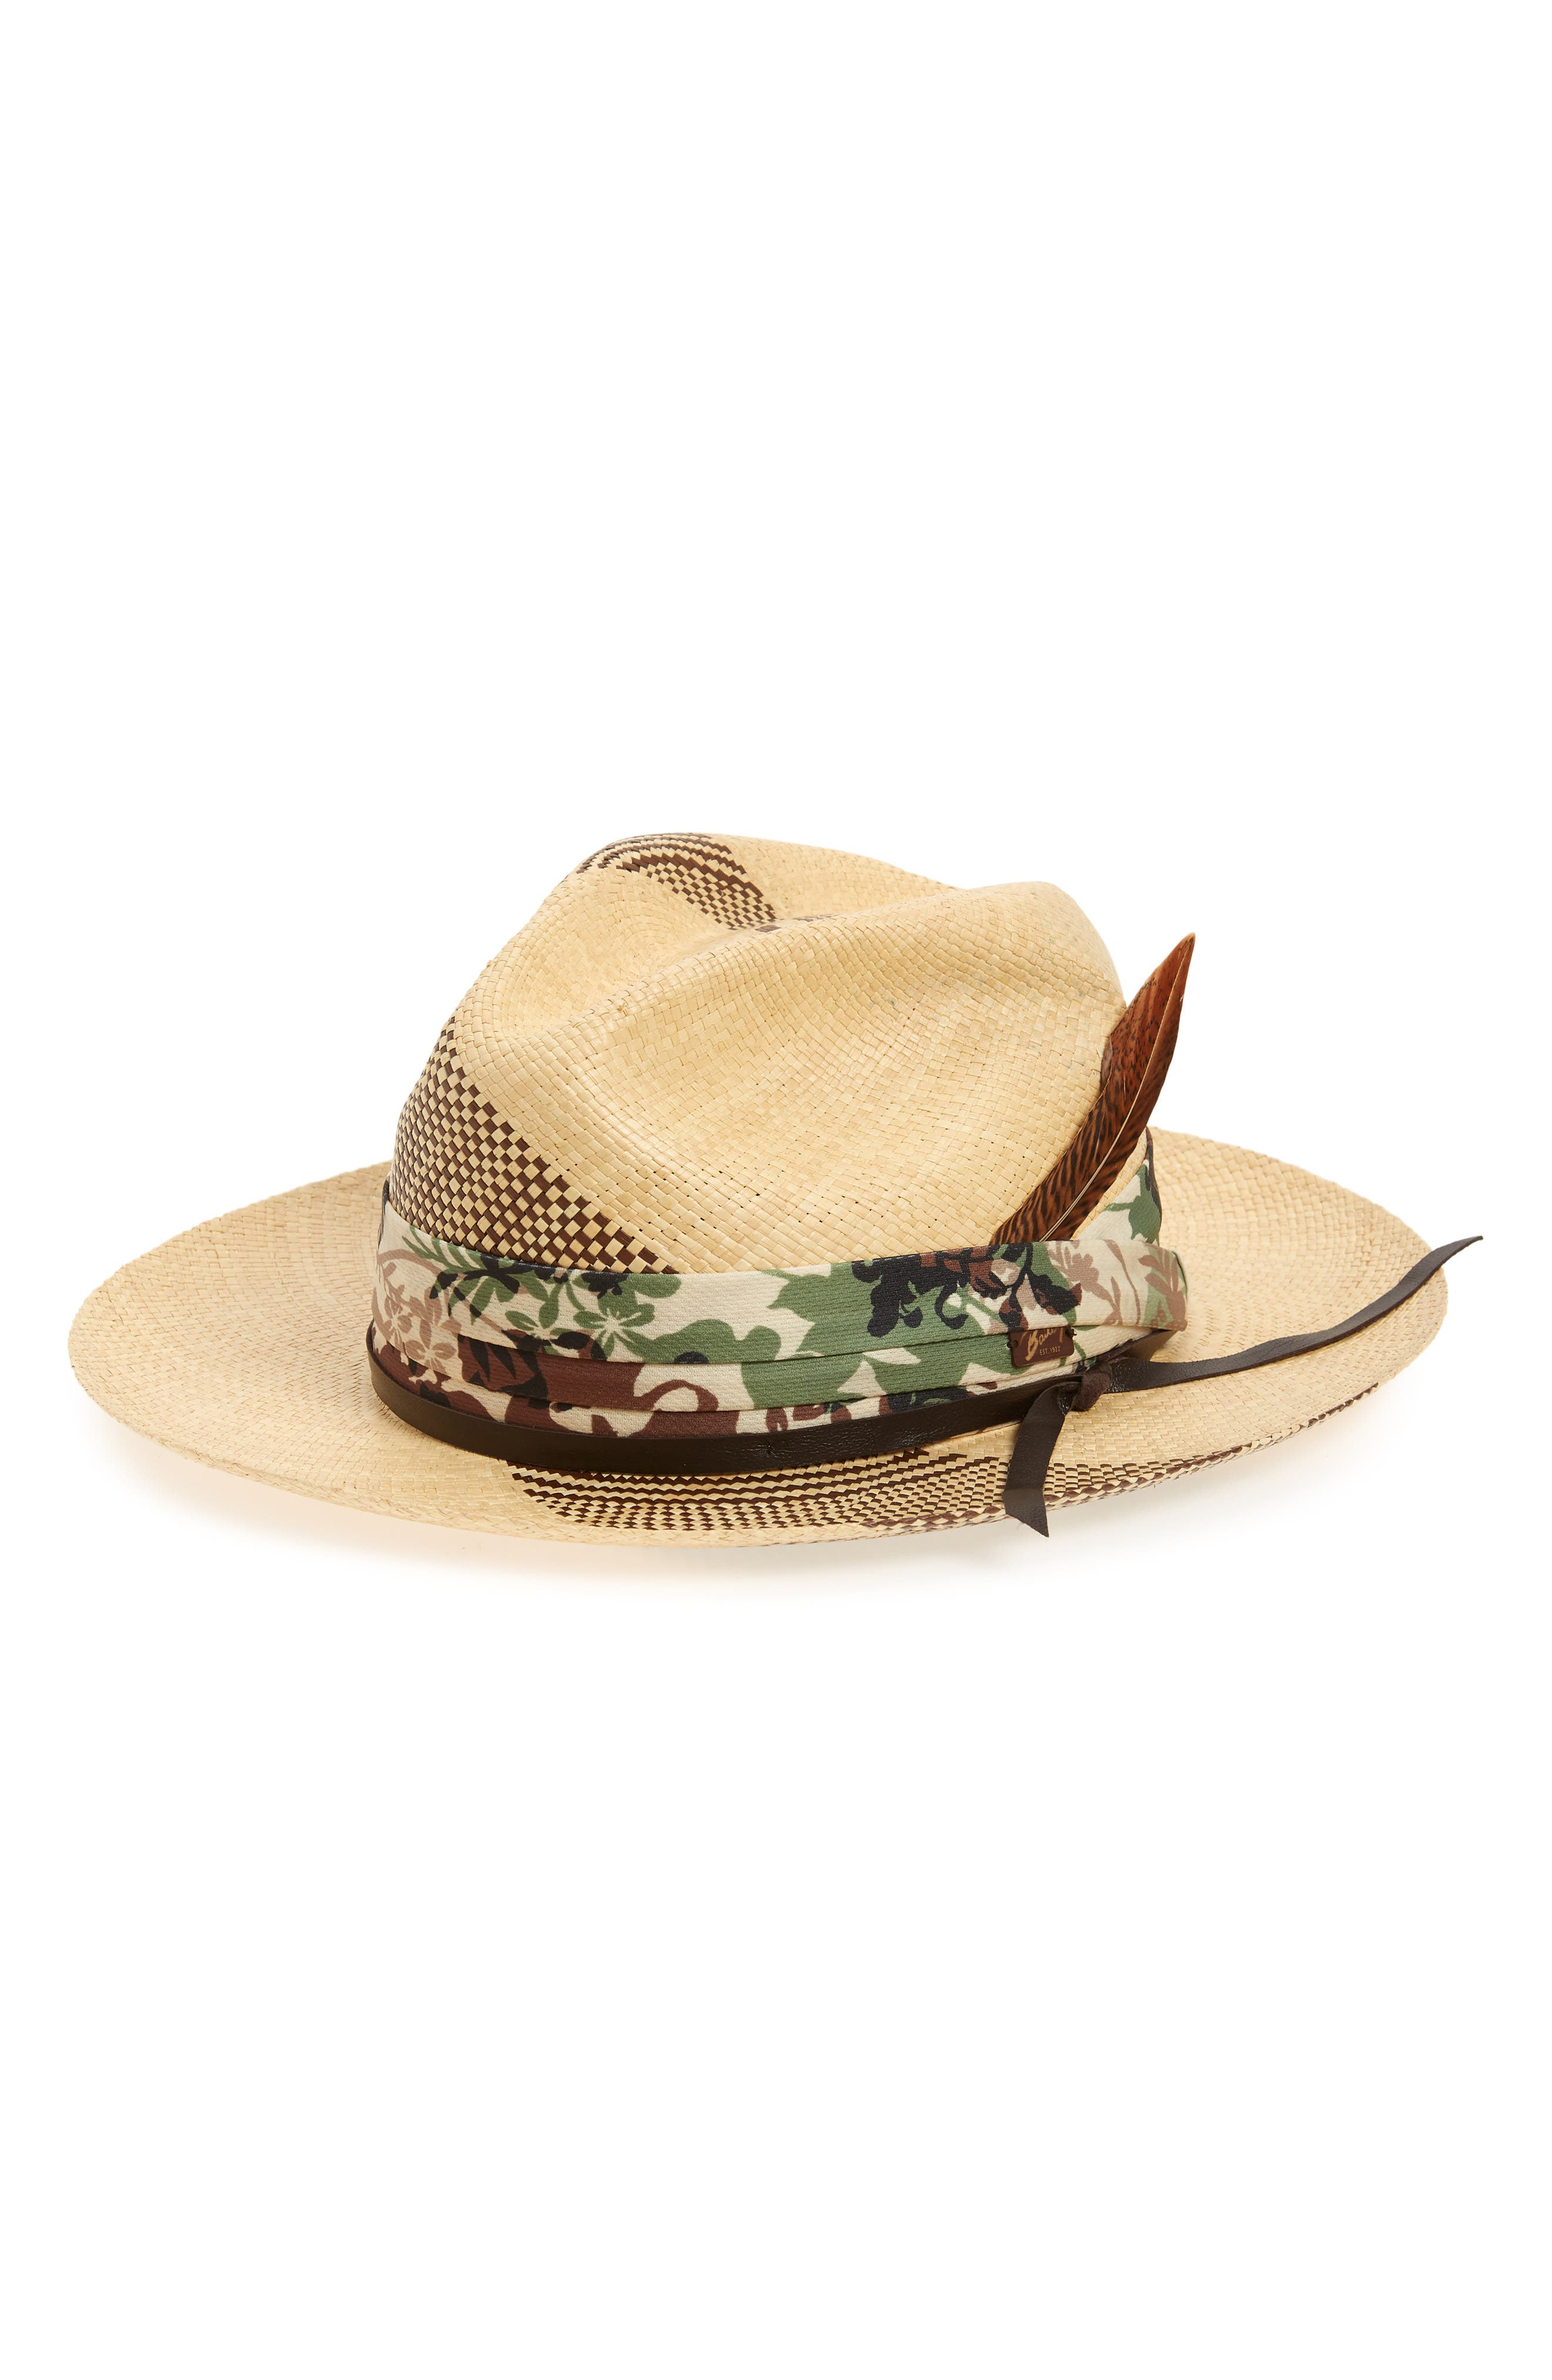 Alternate Image 1 Selected - Bailey Rayney Straw Panama Hat